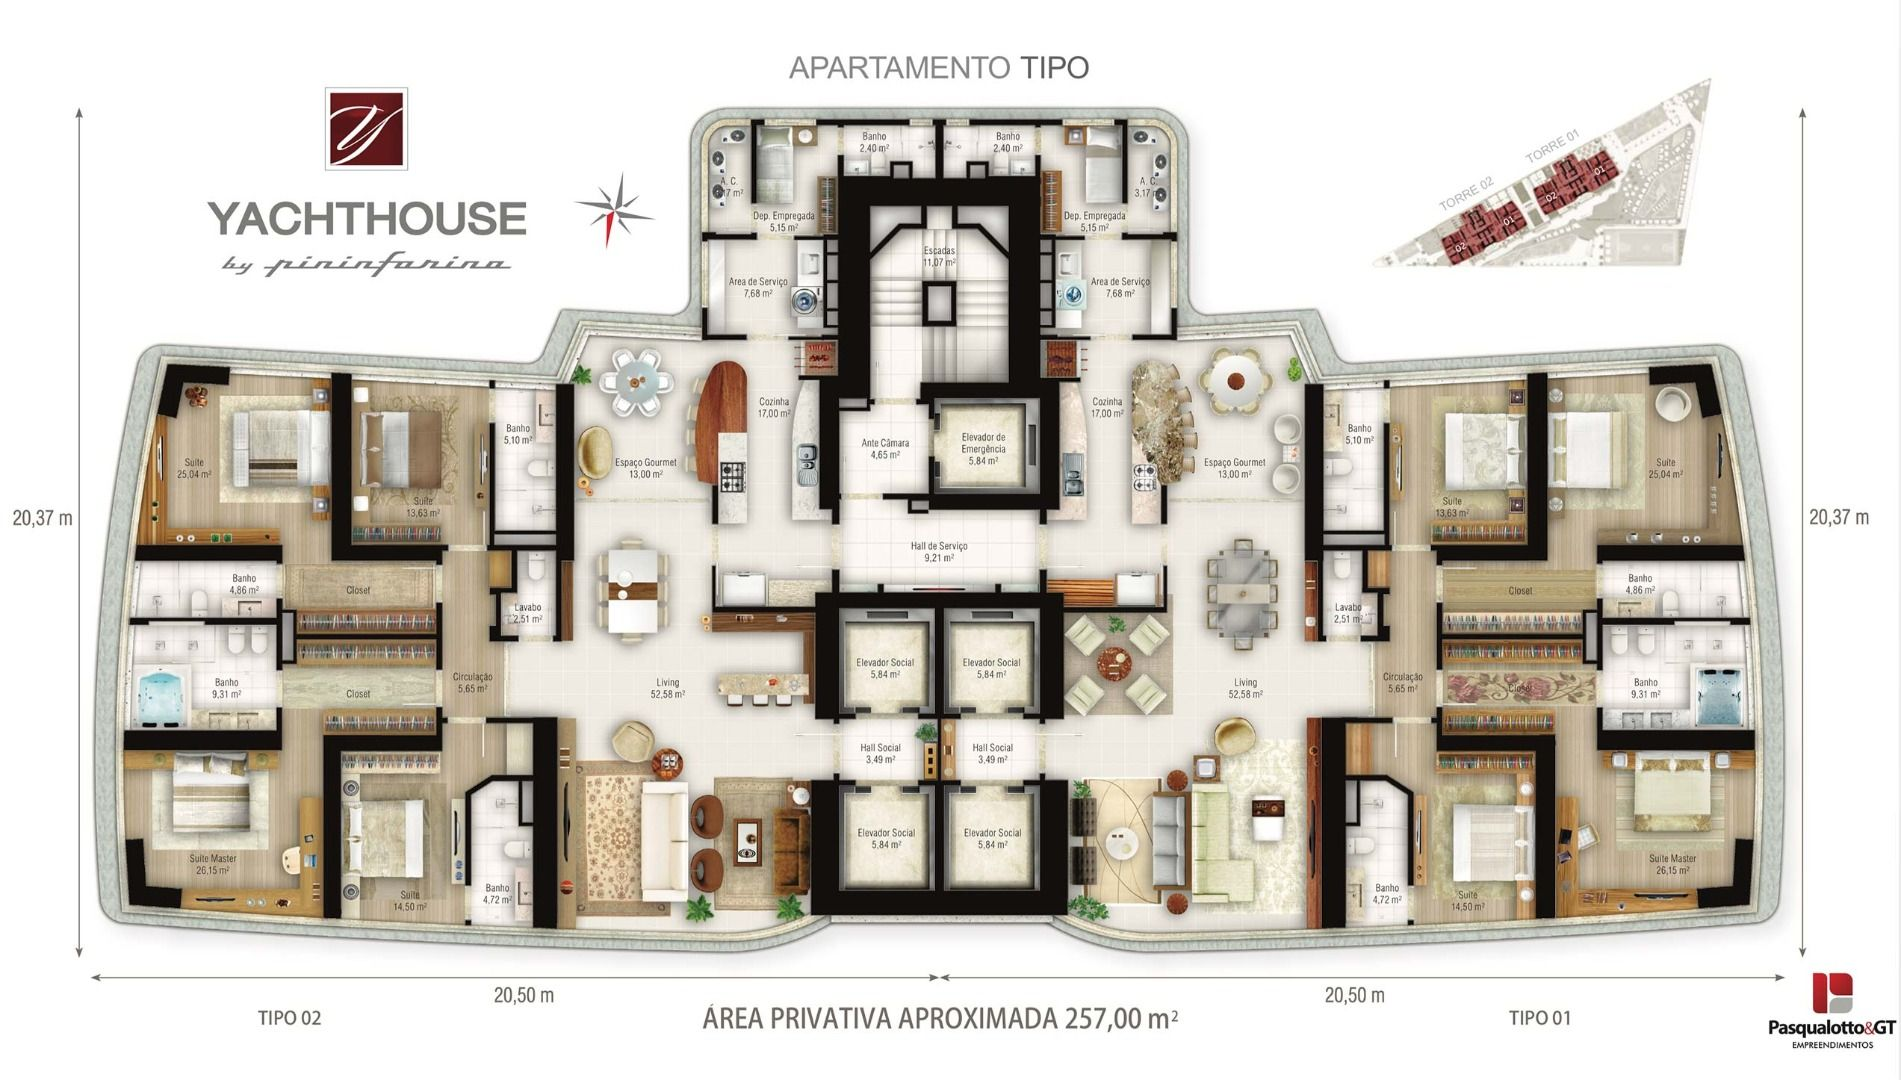 Planta do Yachthouse By Pininfarina. floorplan